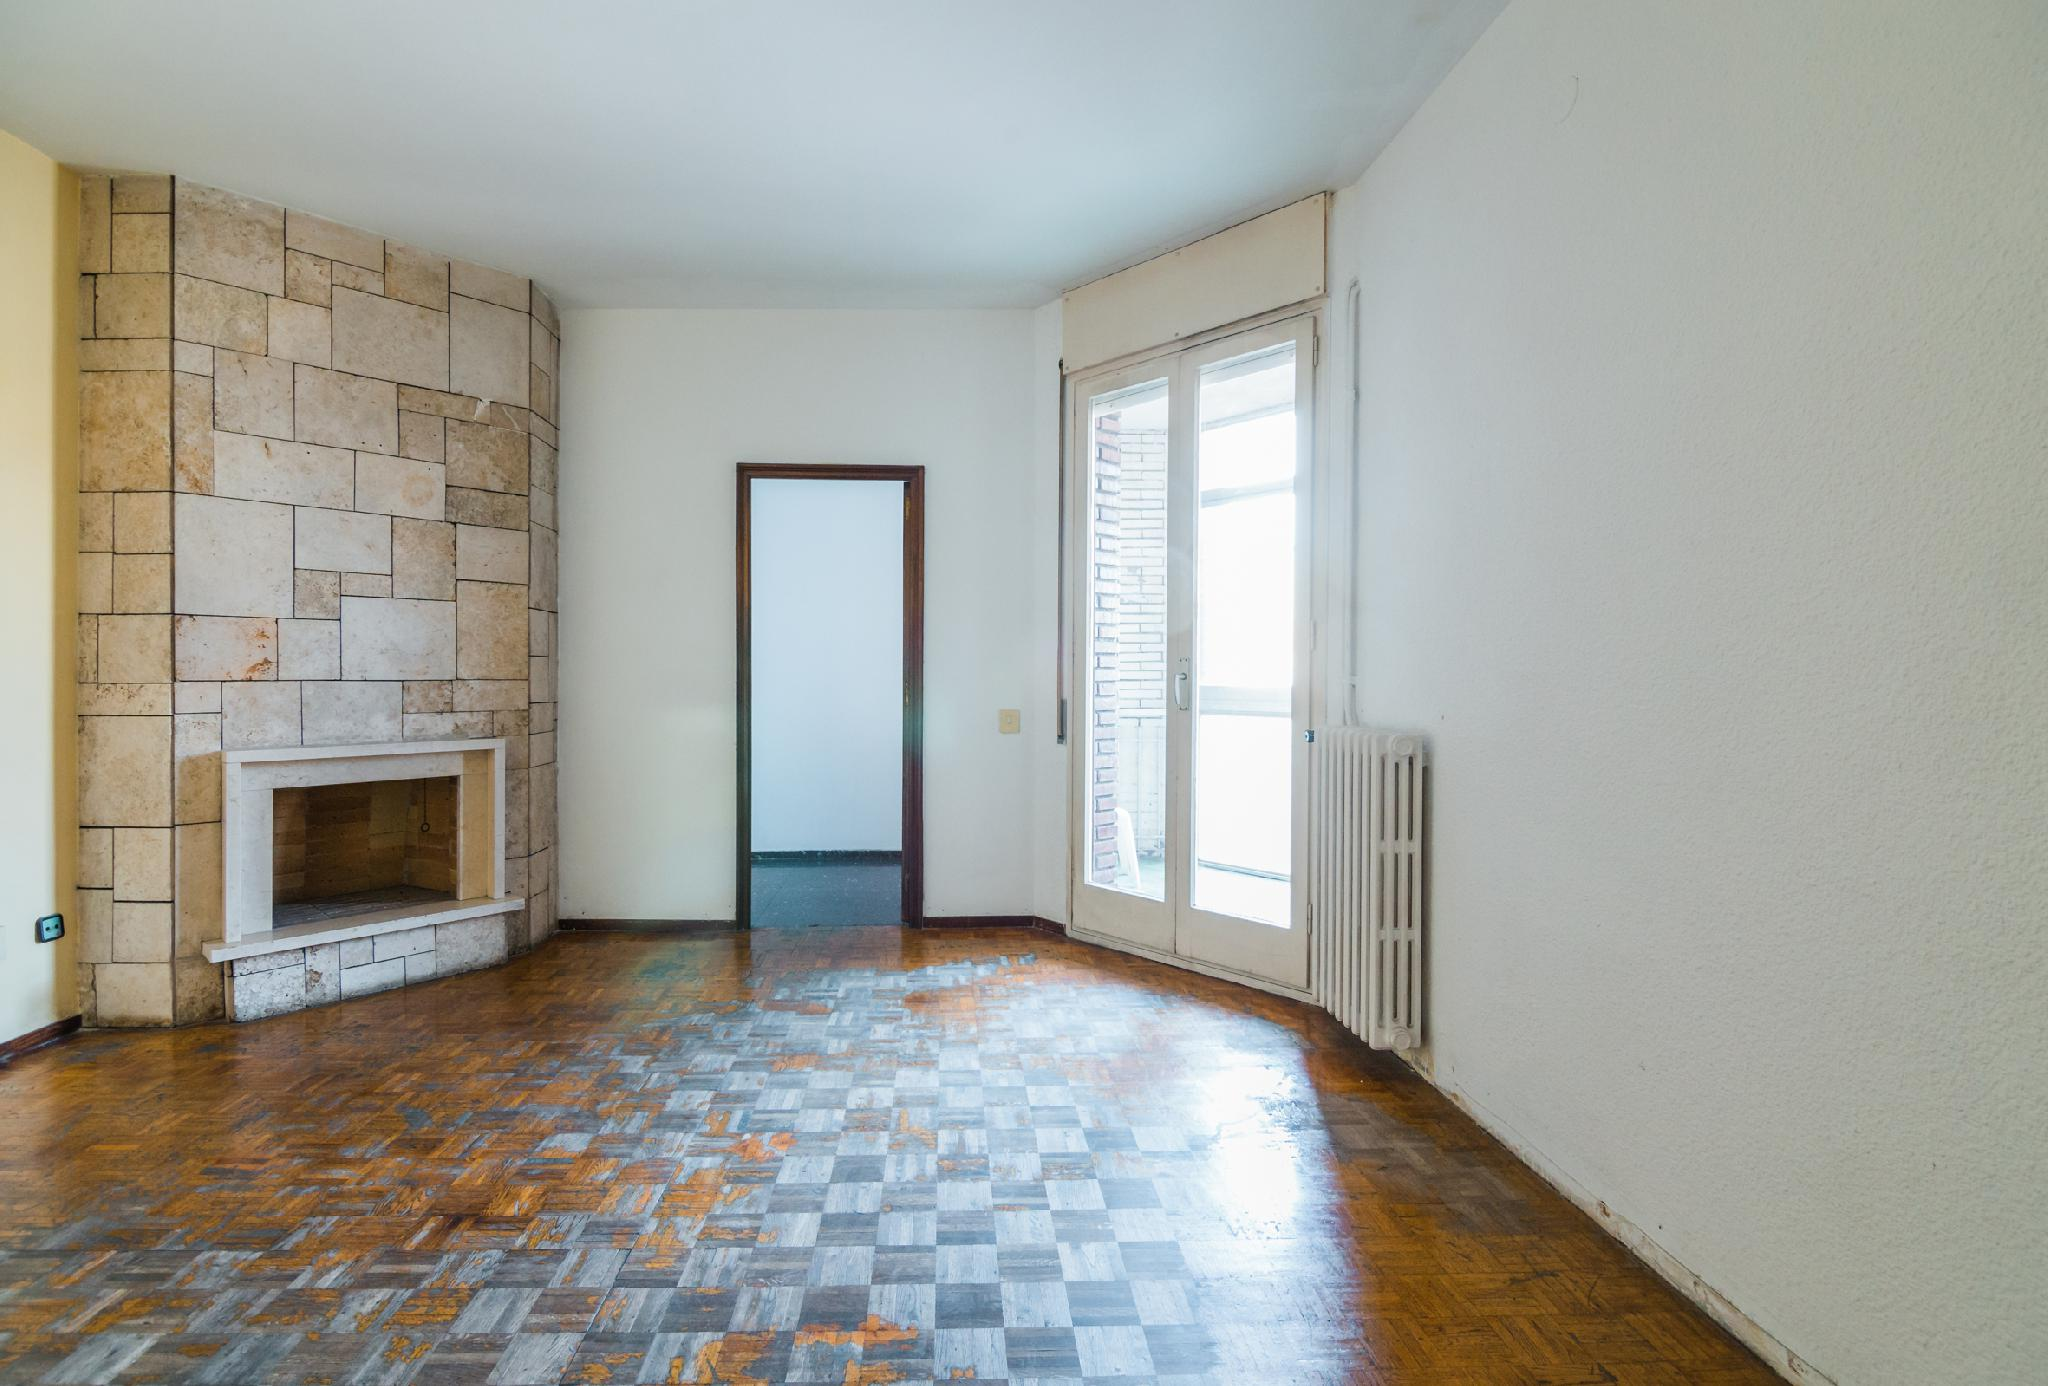 181303 - Junto calle Sardenya